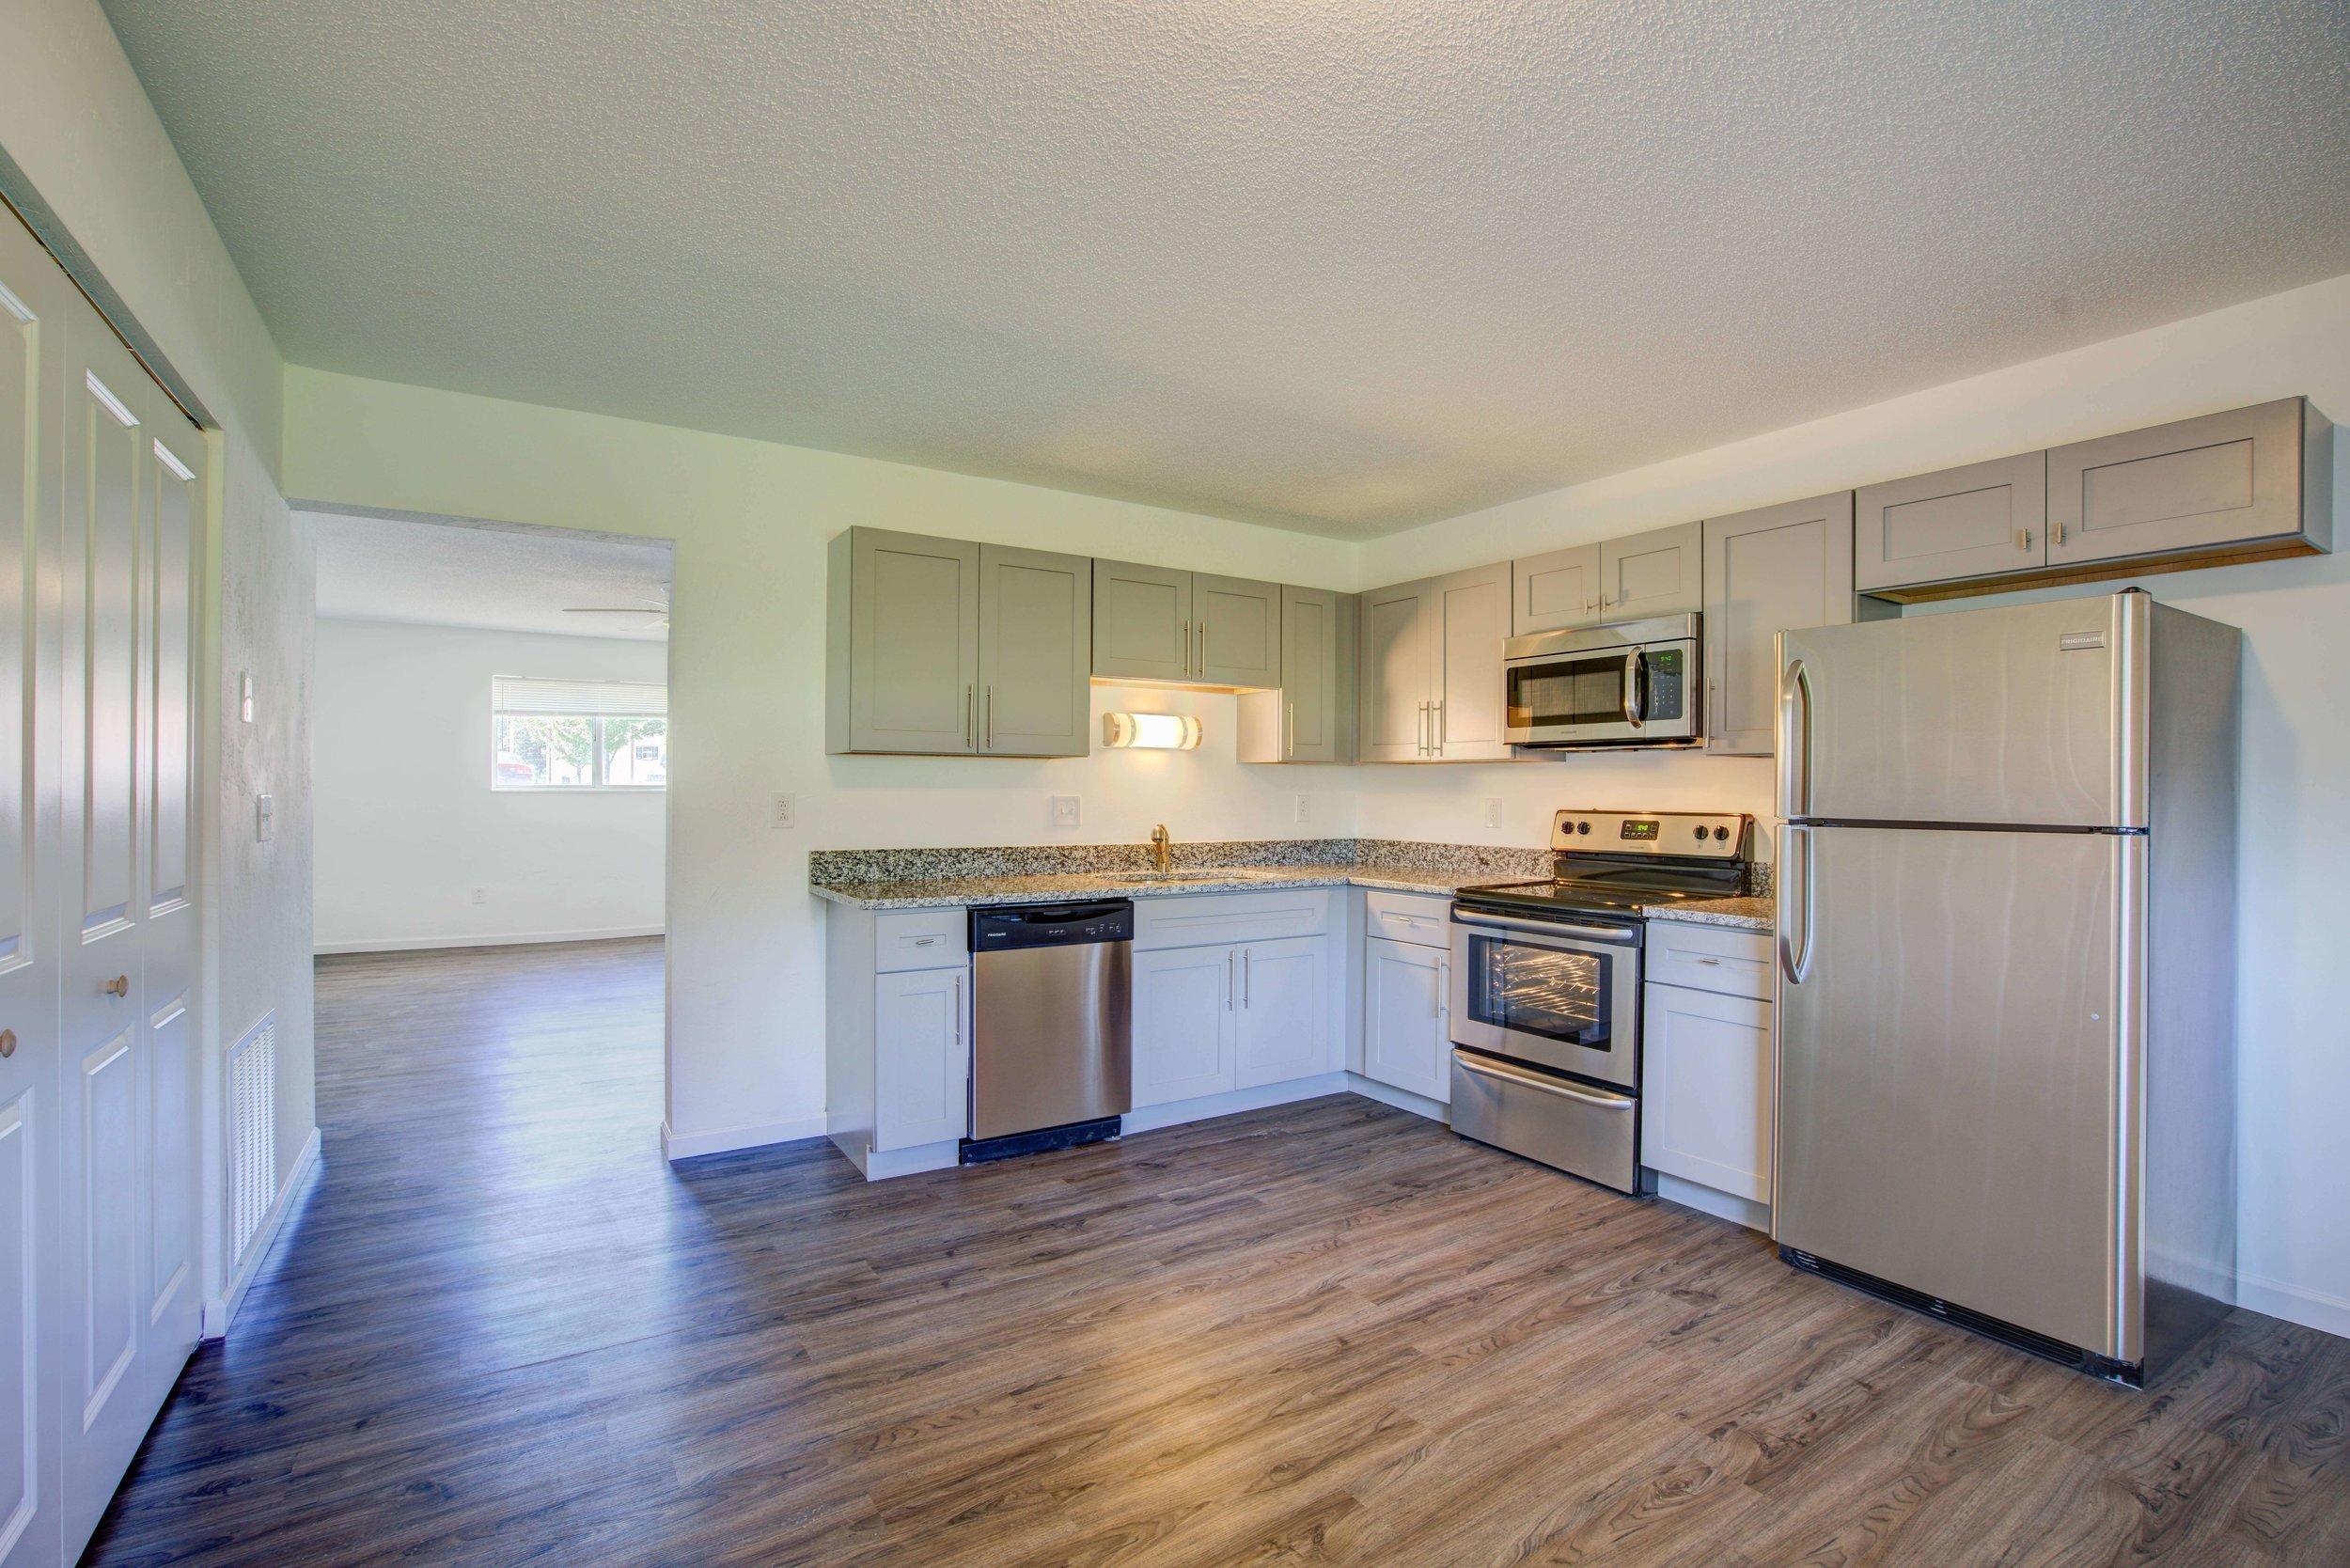 Homes For Rent O'Fallon, Illinois